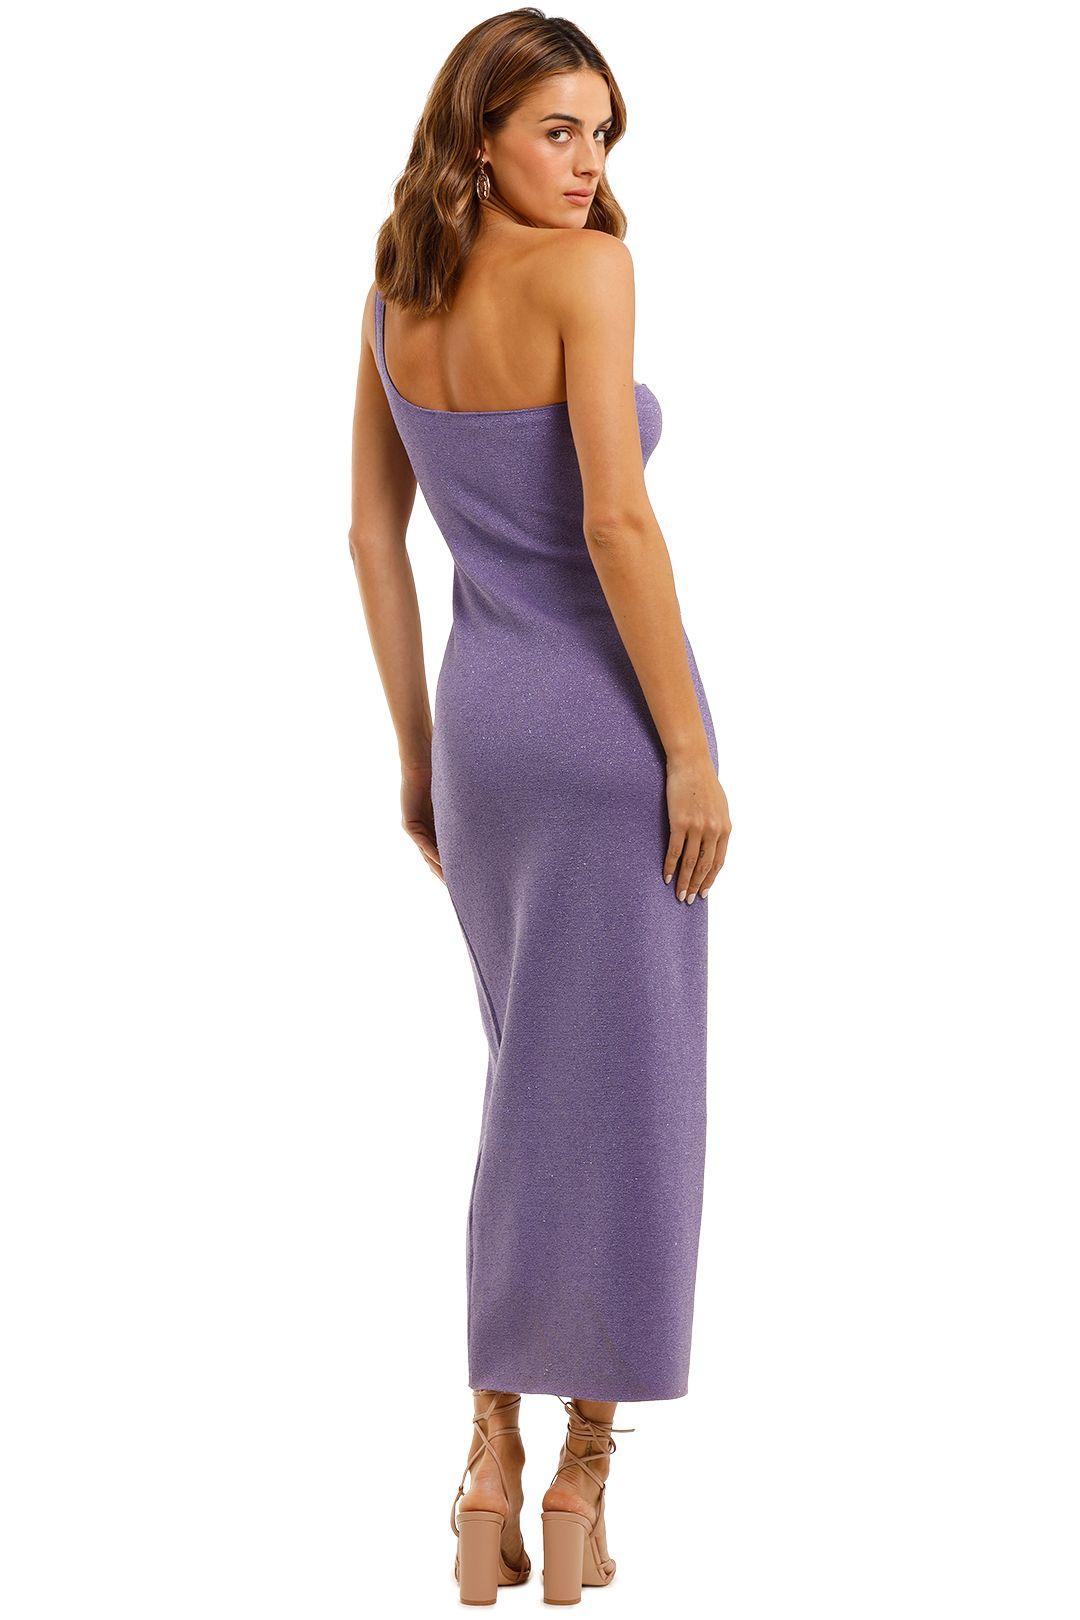 Bec and Bridge Adalane Asymmetric Knit Midi Dress